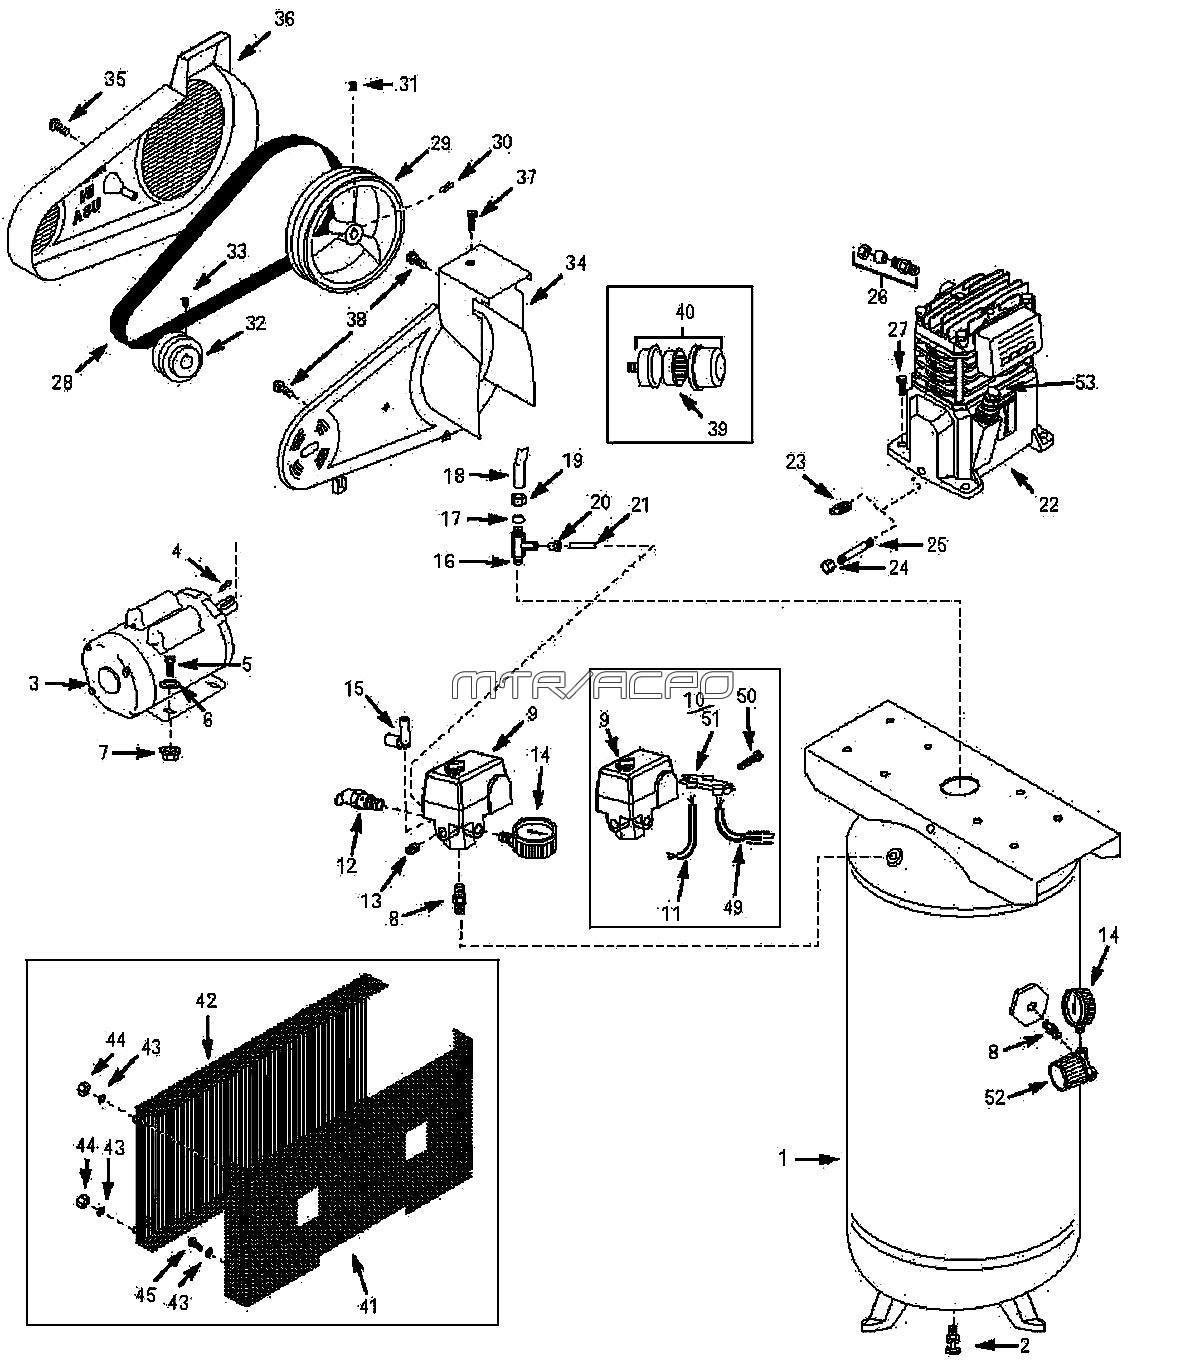 Husky air pressor wiring diagram collection wiring diagram s le rh faceitsalon husky riding mower deck